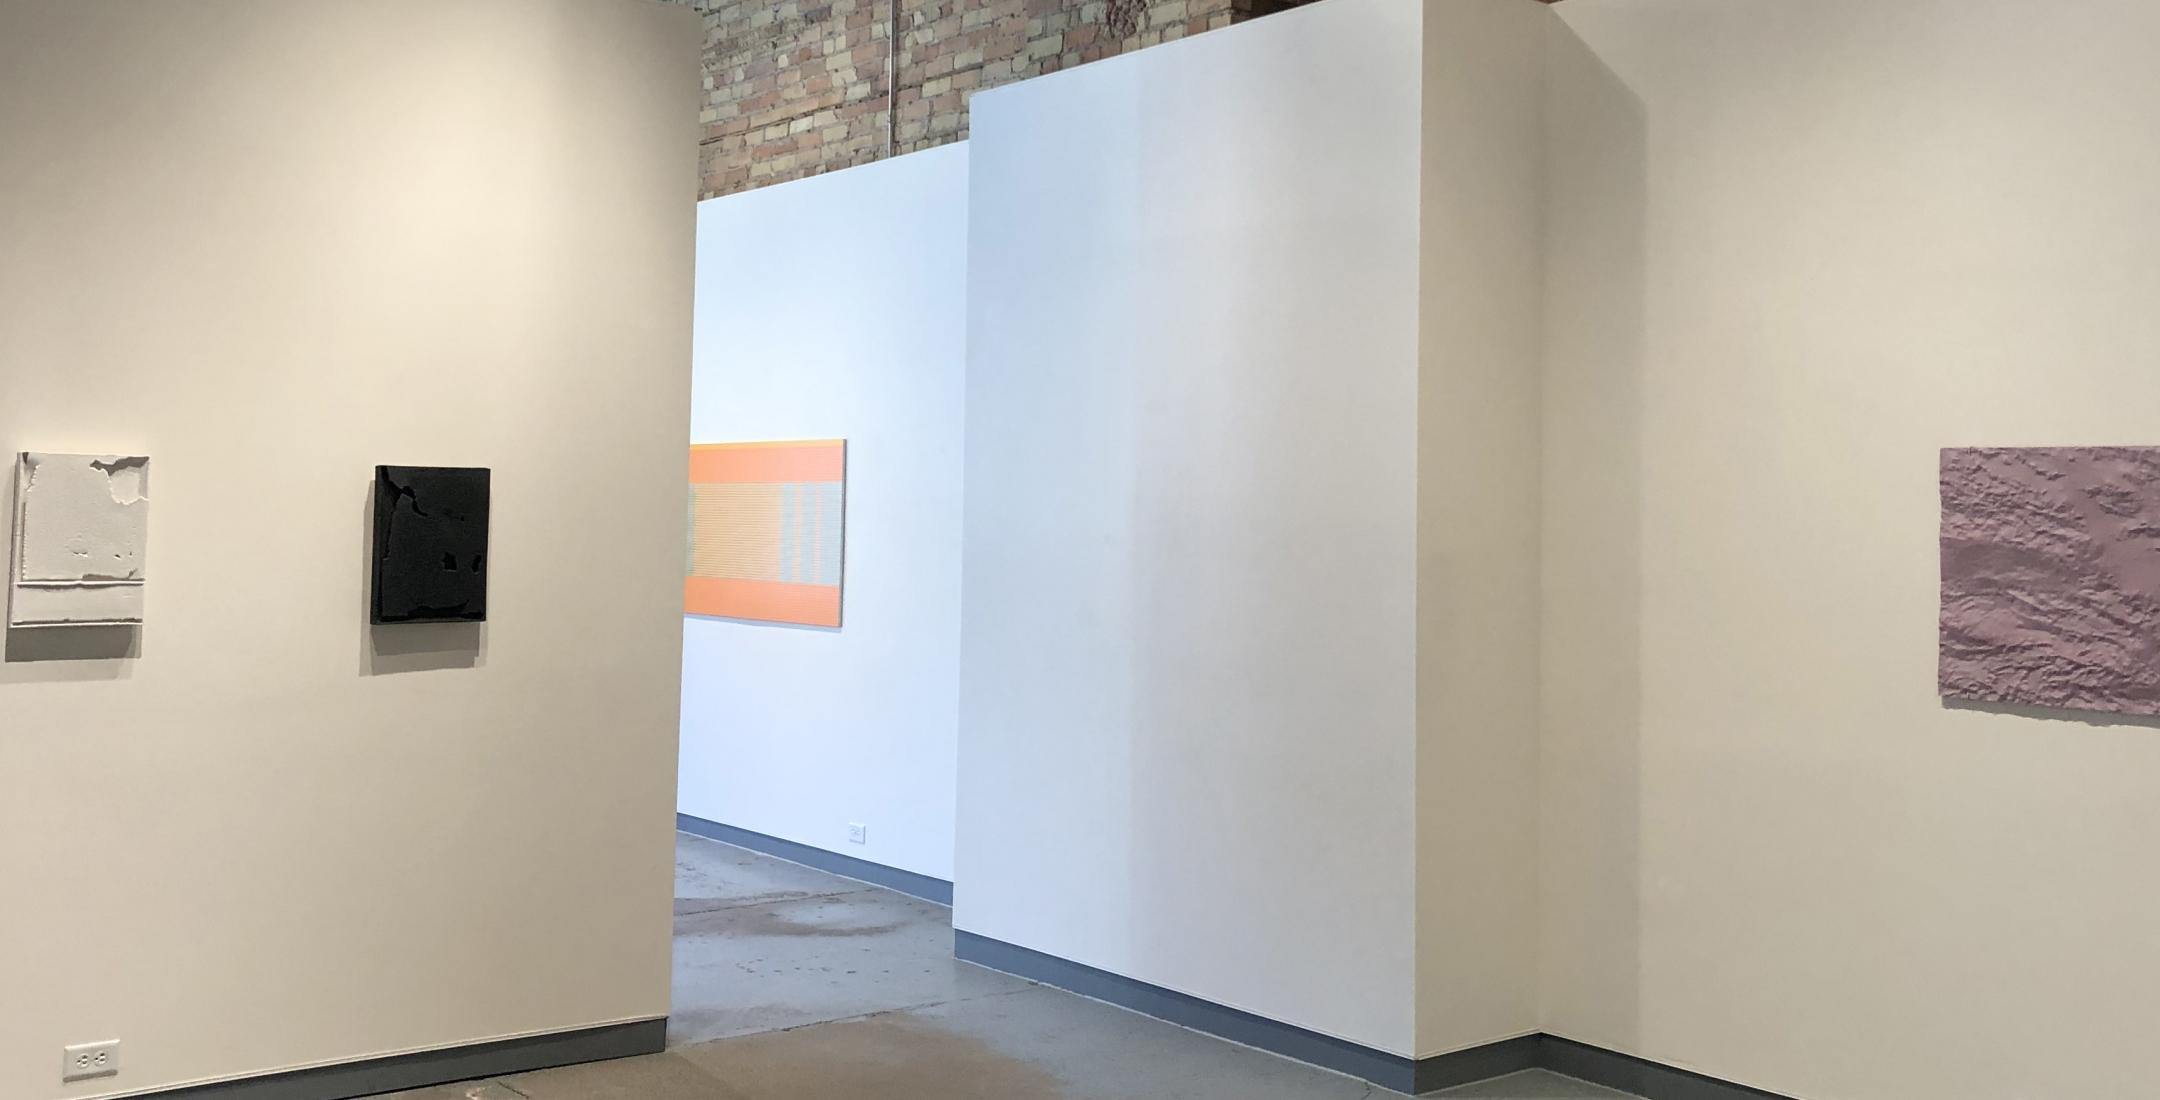 A Warm Reset - installation view (Cary Esser, Matthew Kluber, David Bowen)